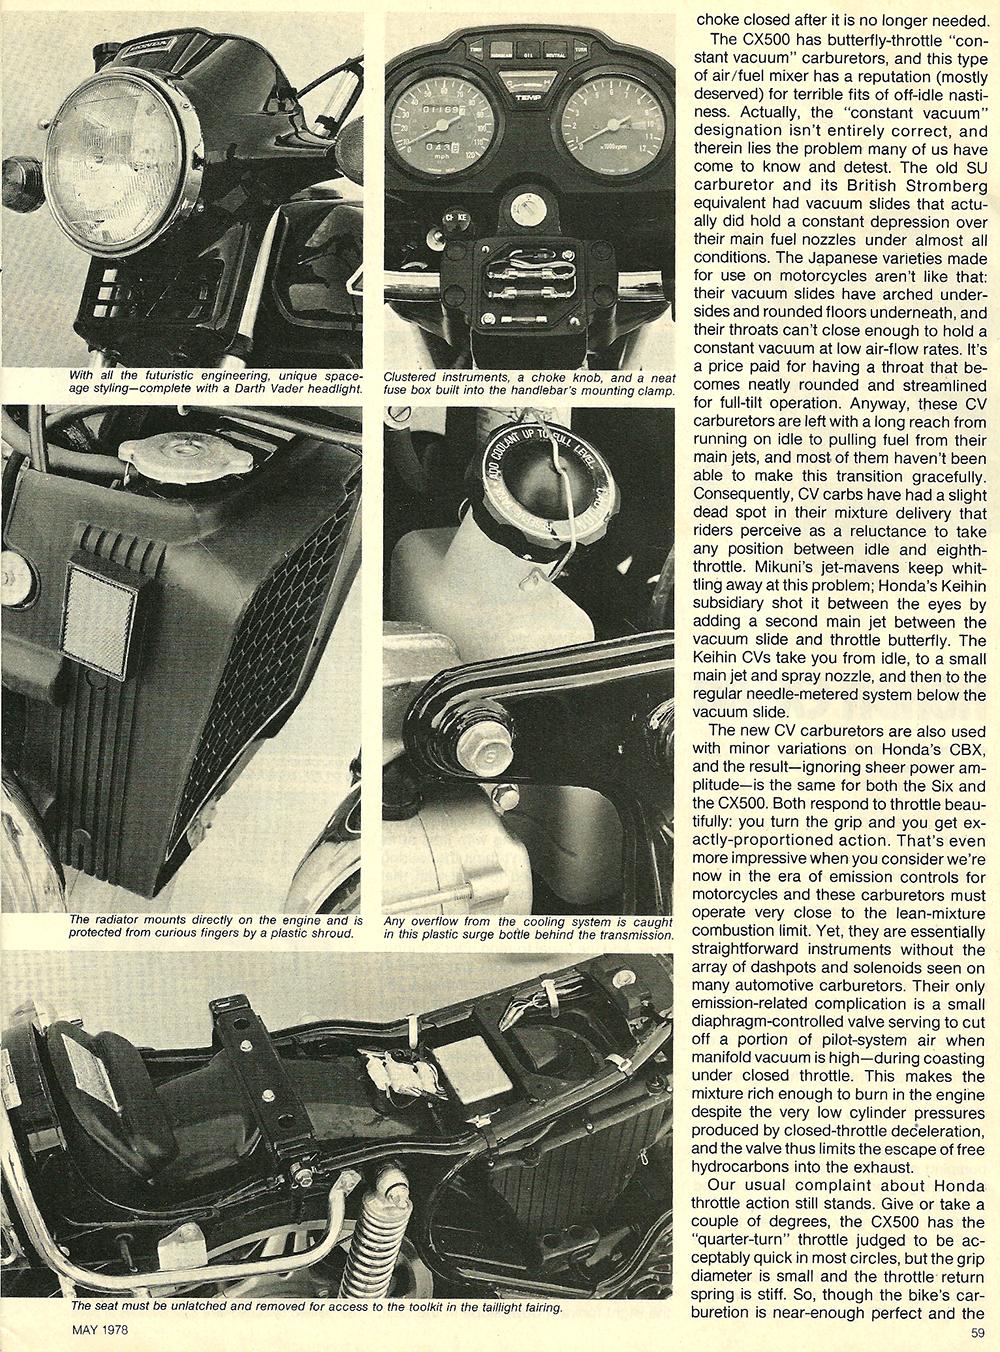 1978 Honda CX500 road test 04.jpg